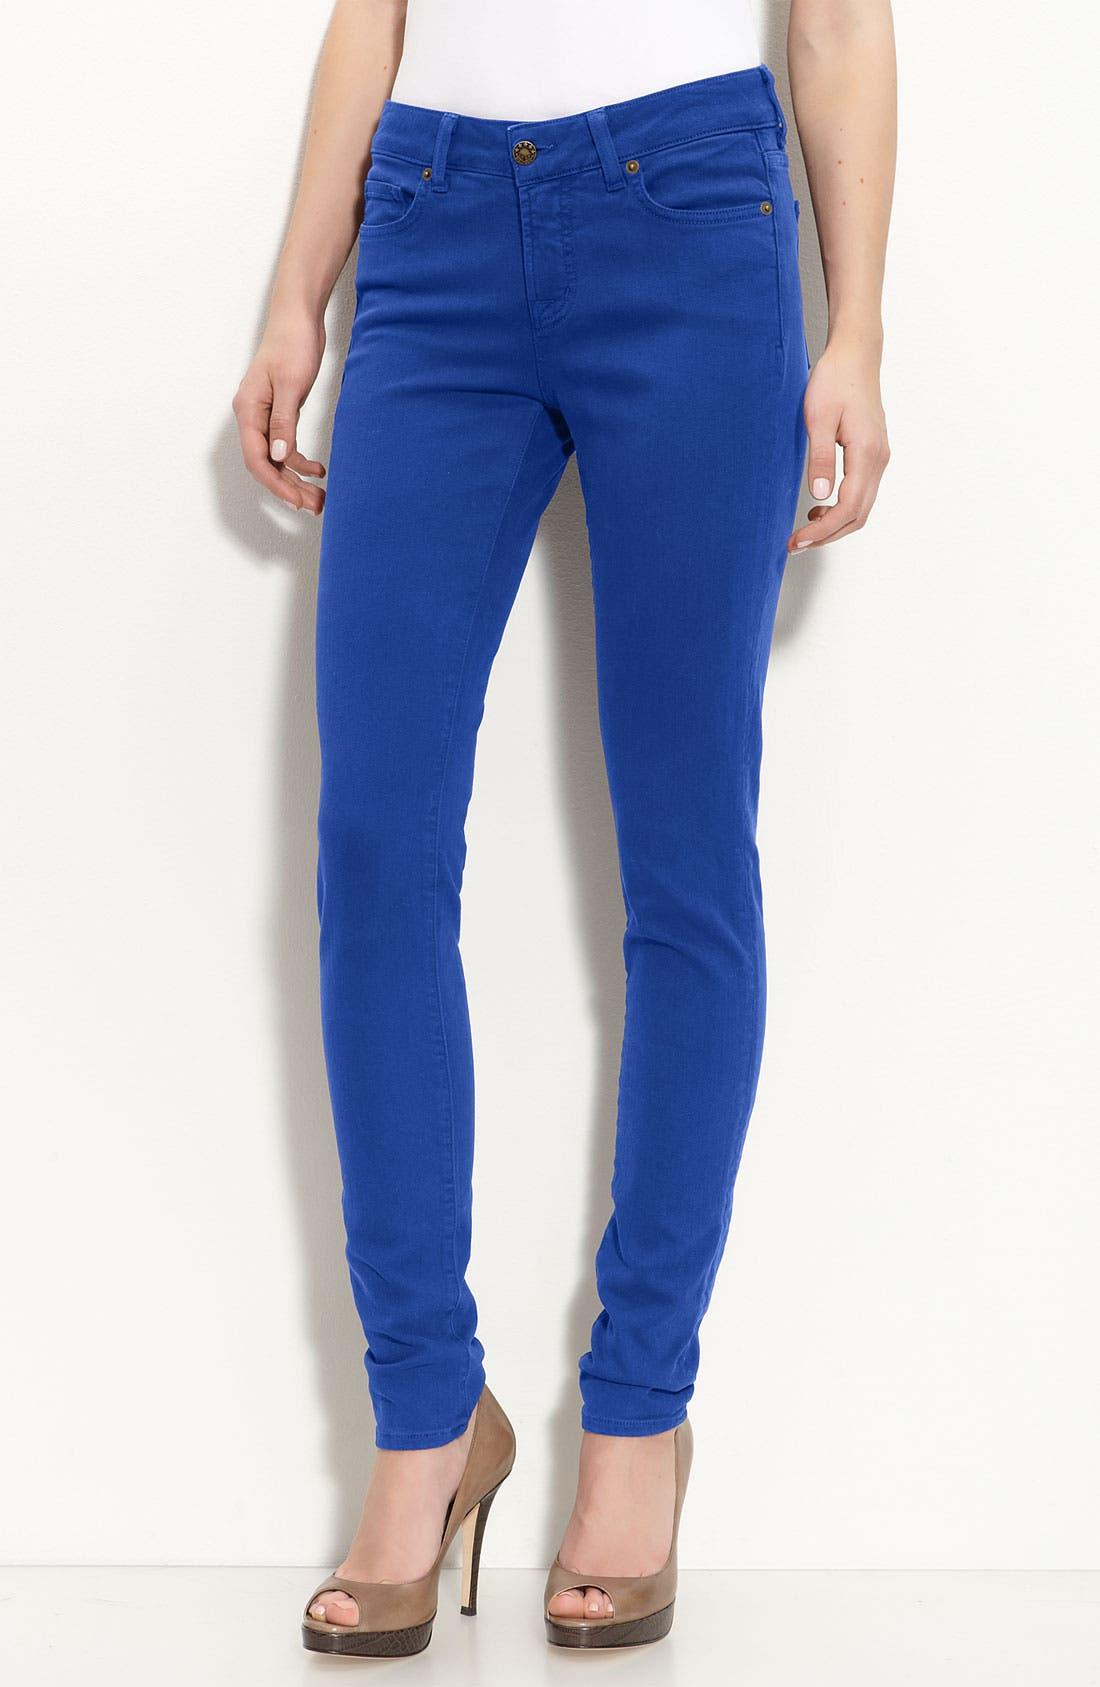 Alternate Image 1 Selected - Blue Essence Color Skinny Jeans (Nordstrom Exclusive)